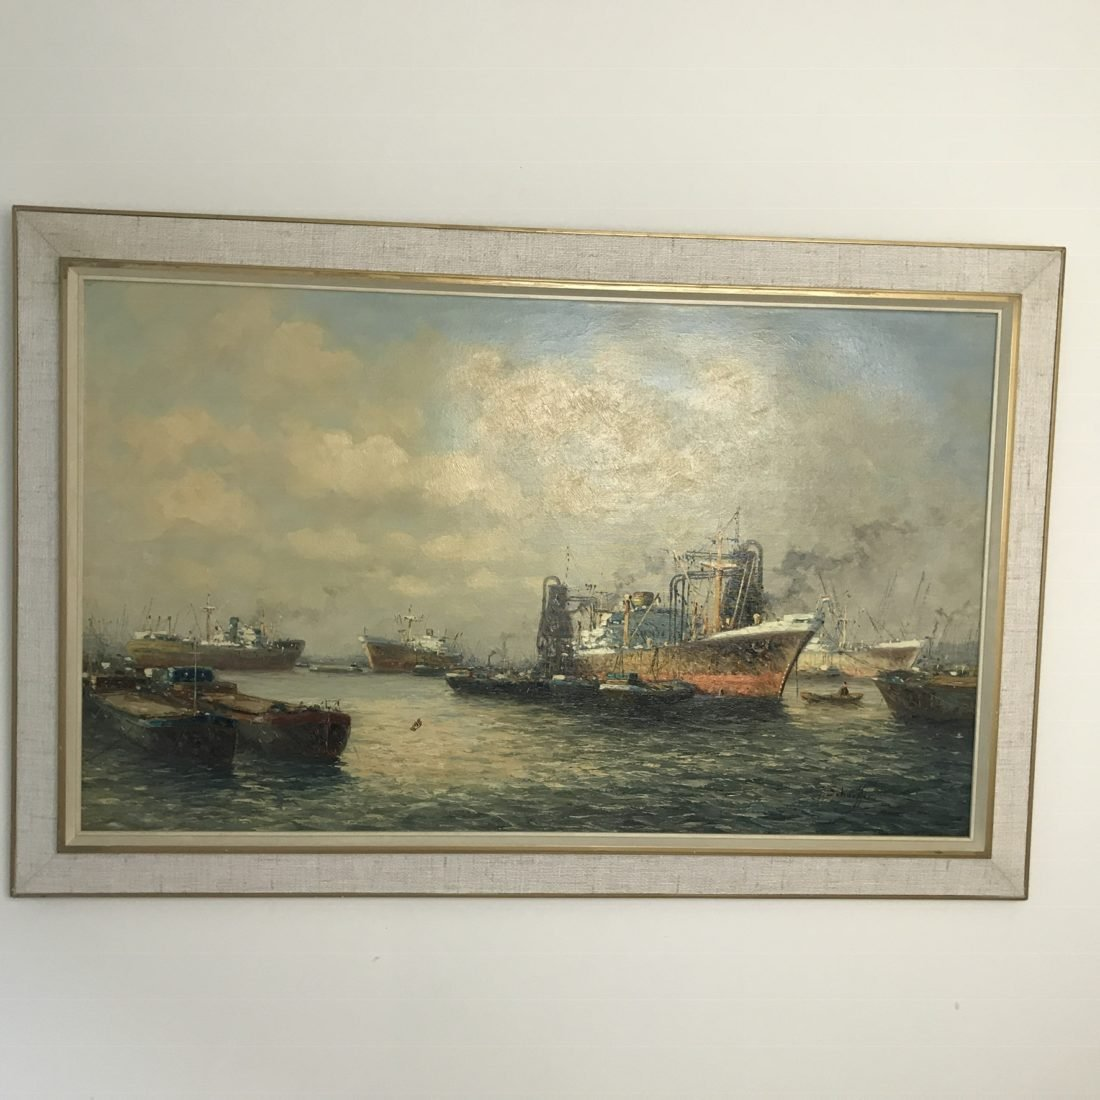 Jan Schaeffer, (1923), Zeehavengezicht, olieverf op linnen